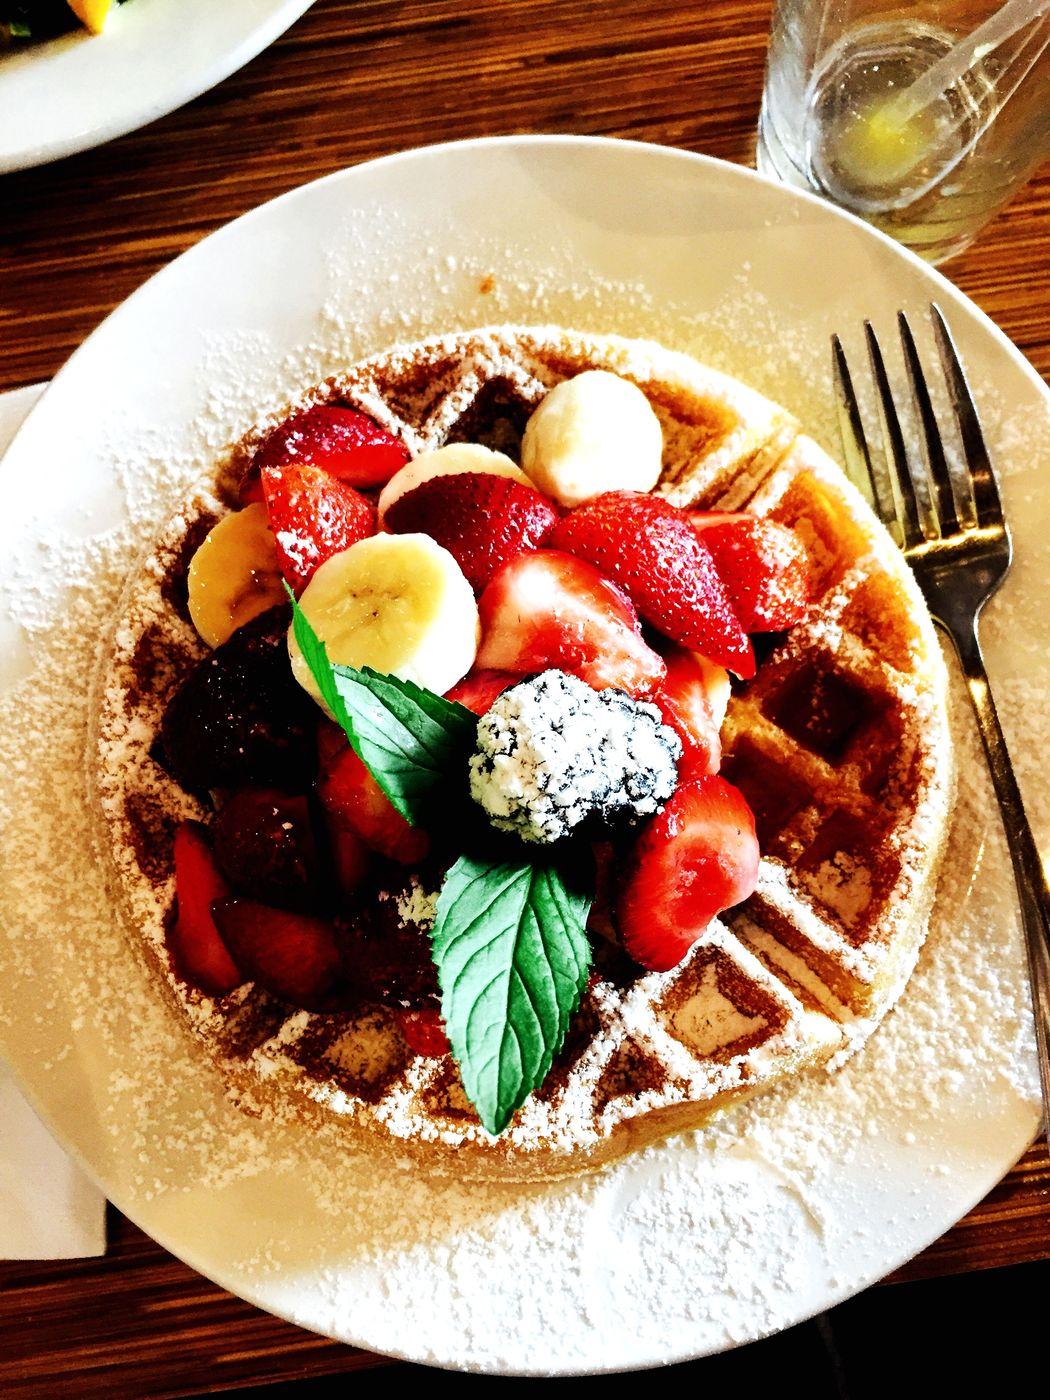 Waffle Breakfast Belgium Fruit Foodporn Chrome Food Sugar French Breakfast